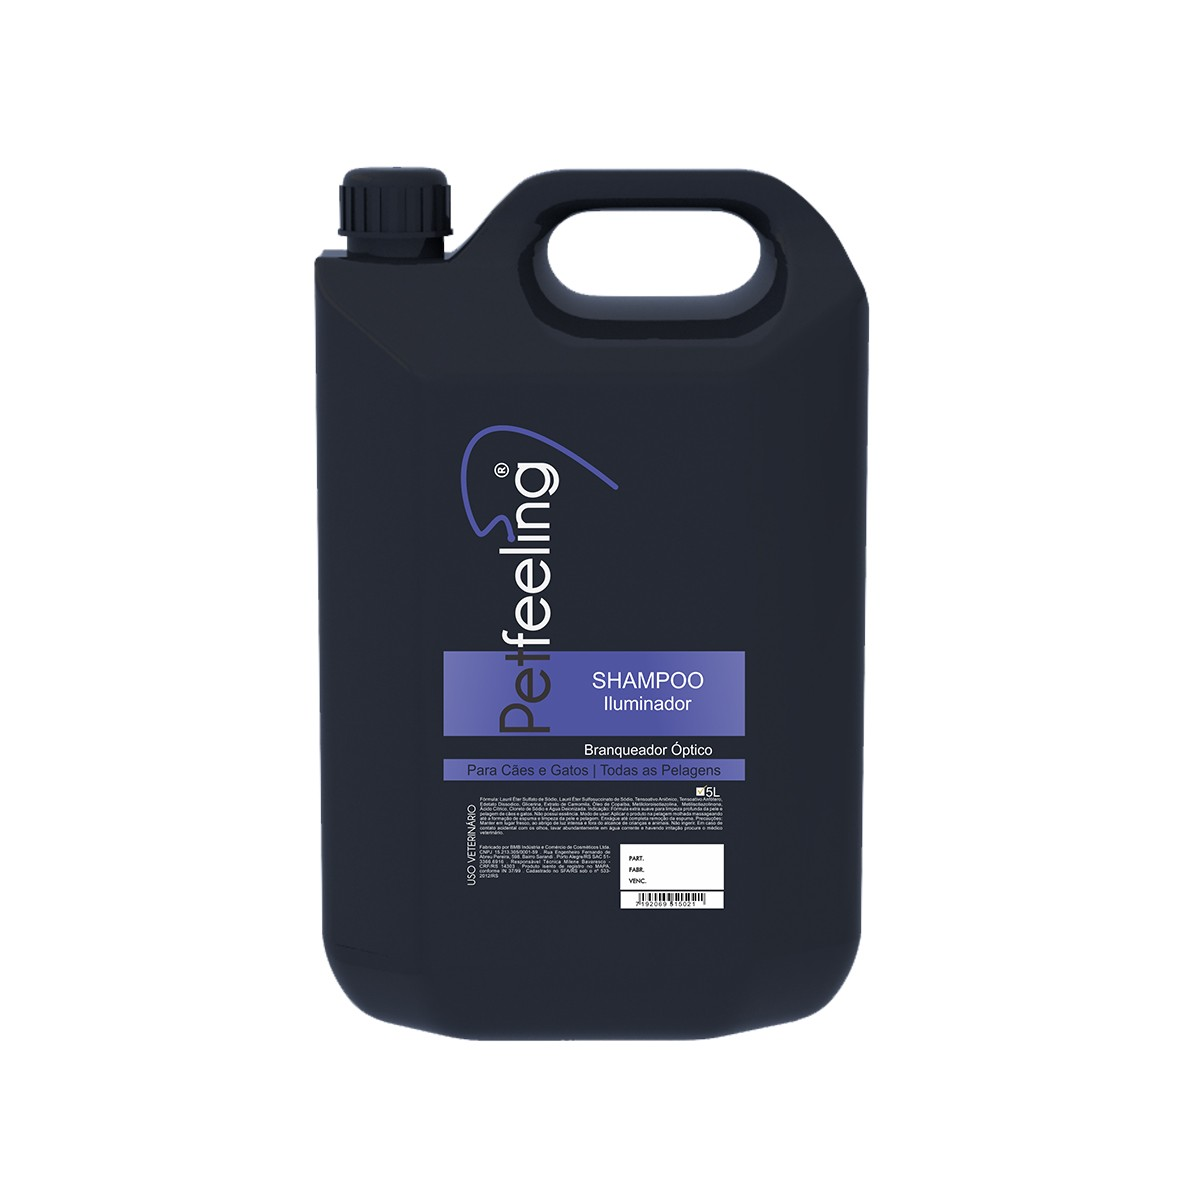 Shampoo Iluminador 5L Petfeeling